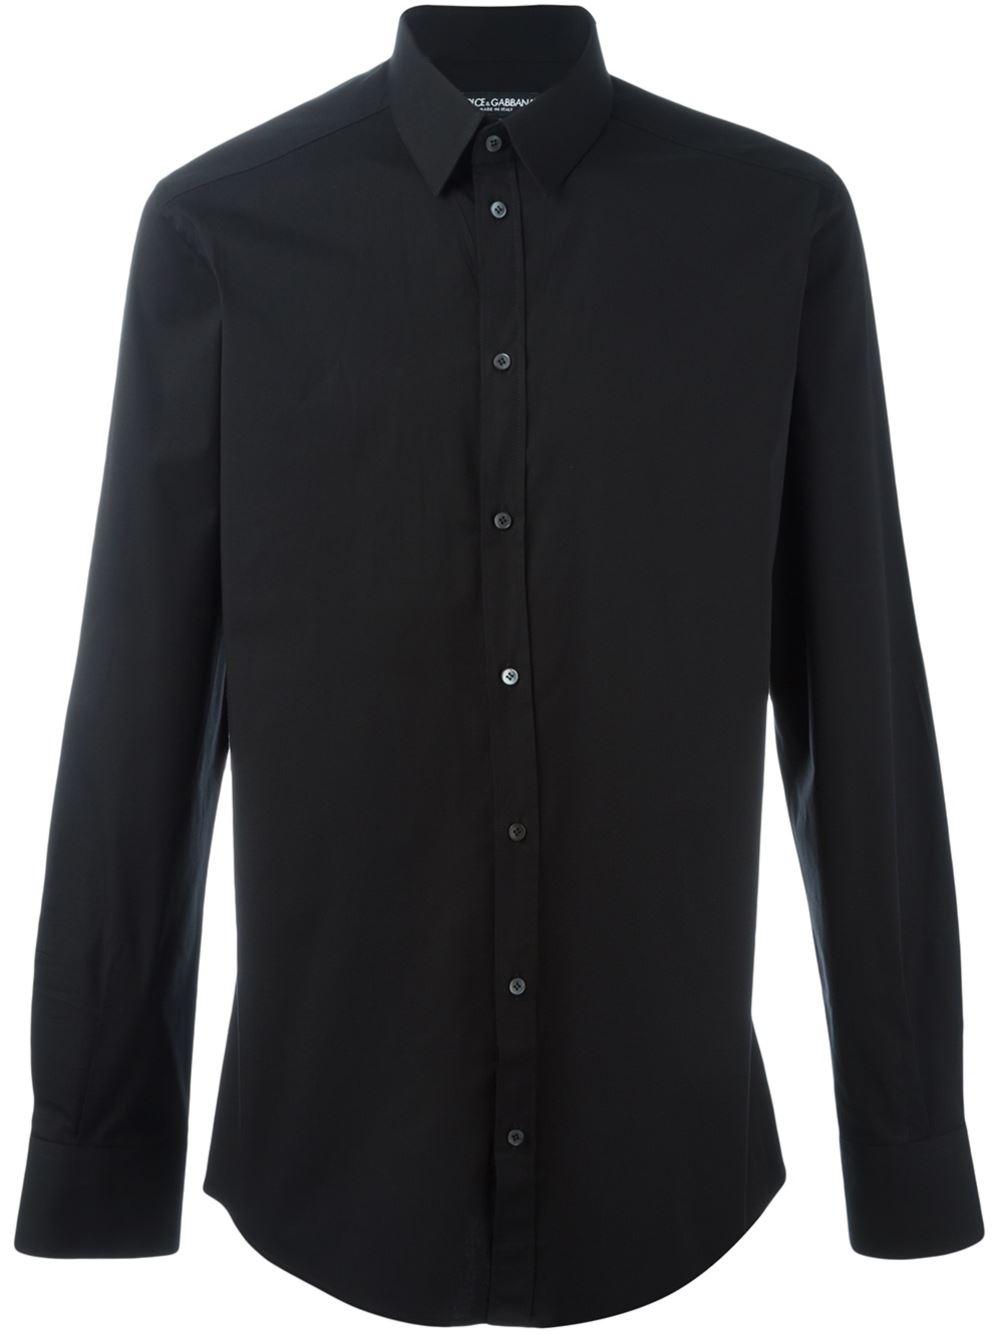 Dolce Gabbana Classic Shirt In Black For Men Lyst